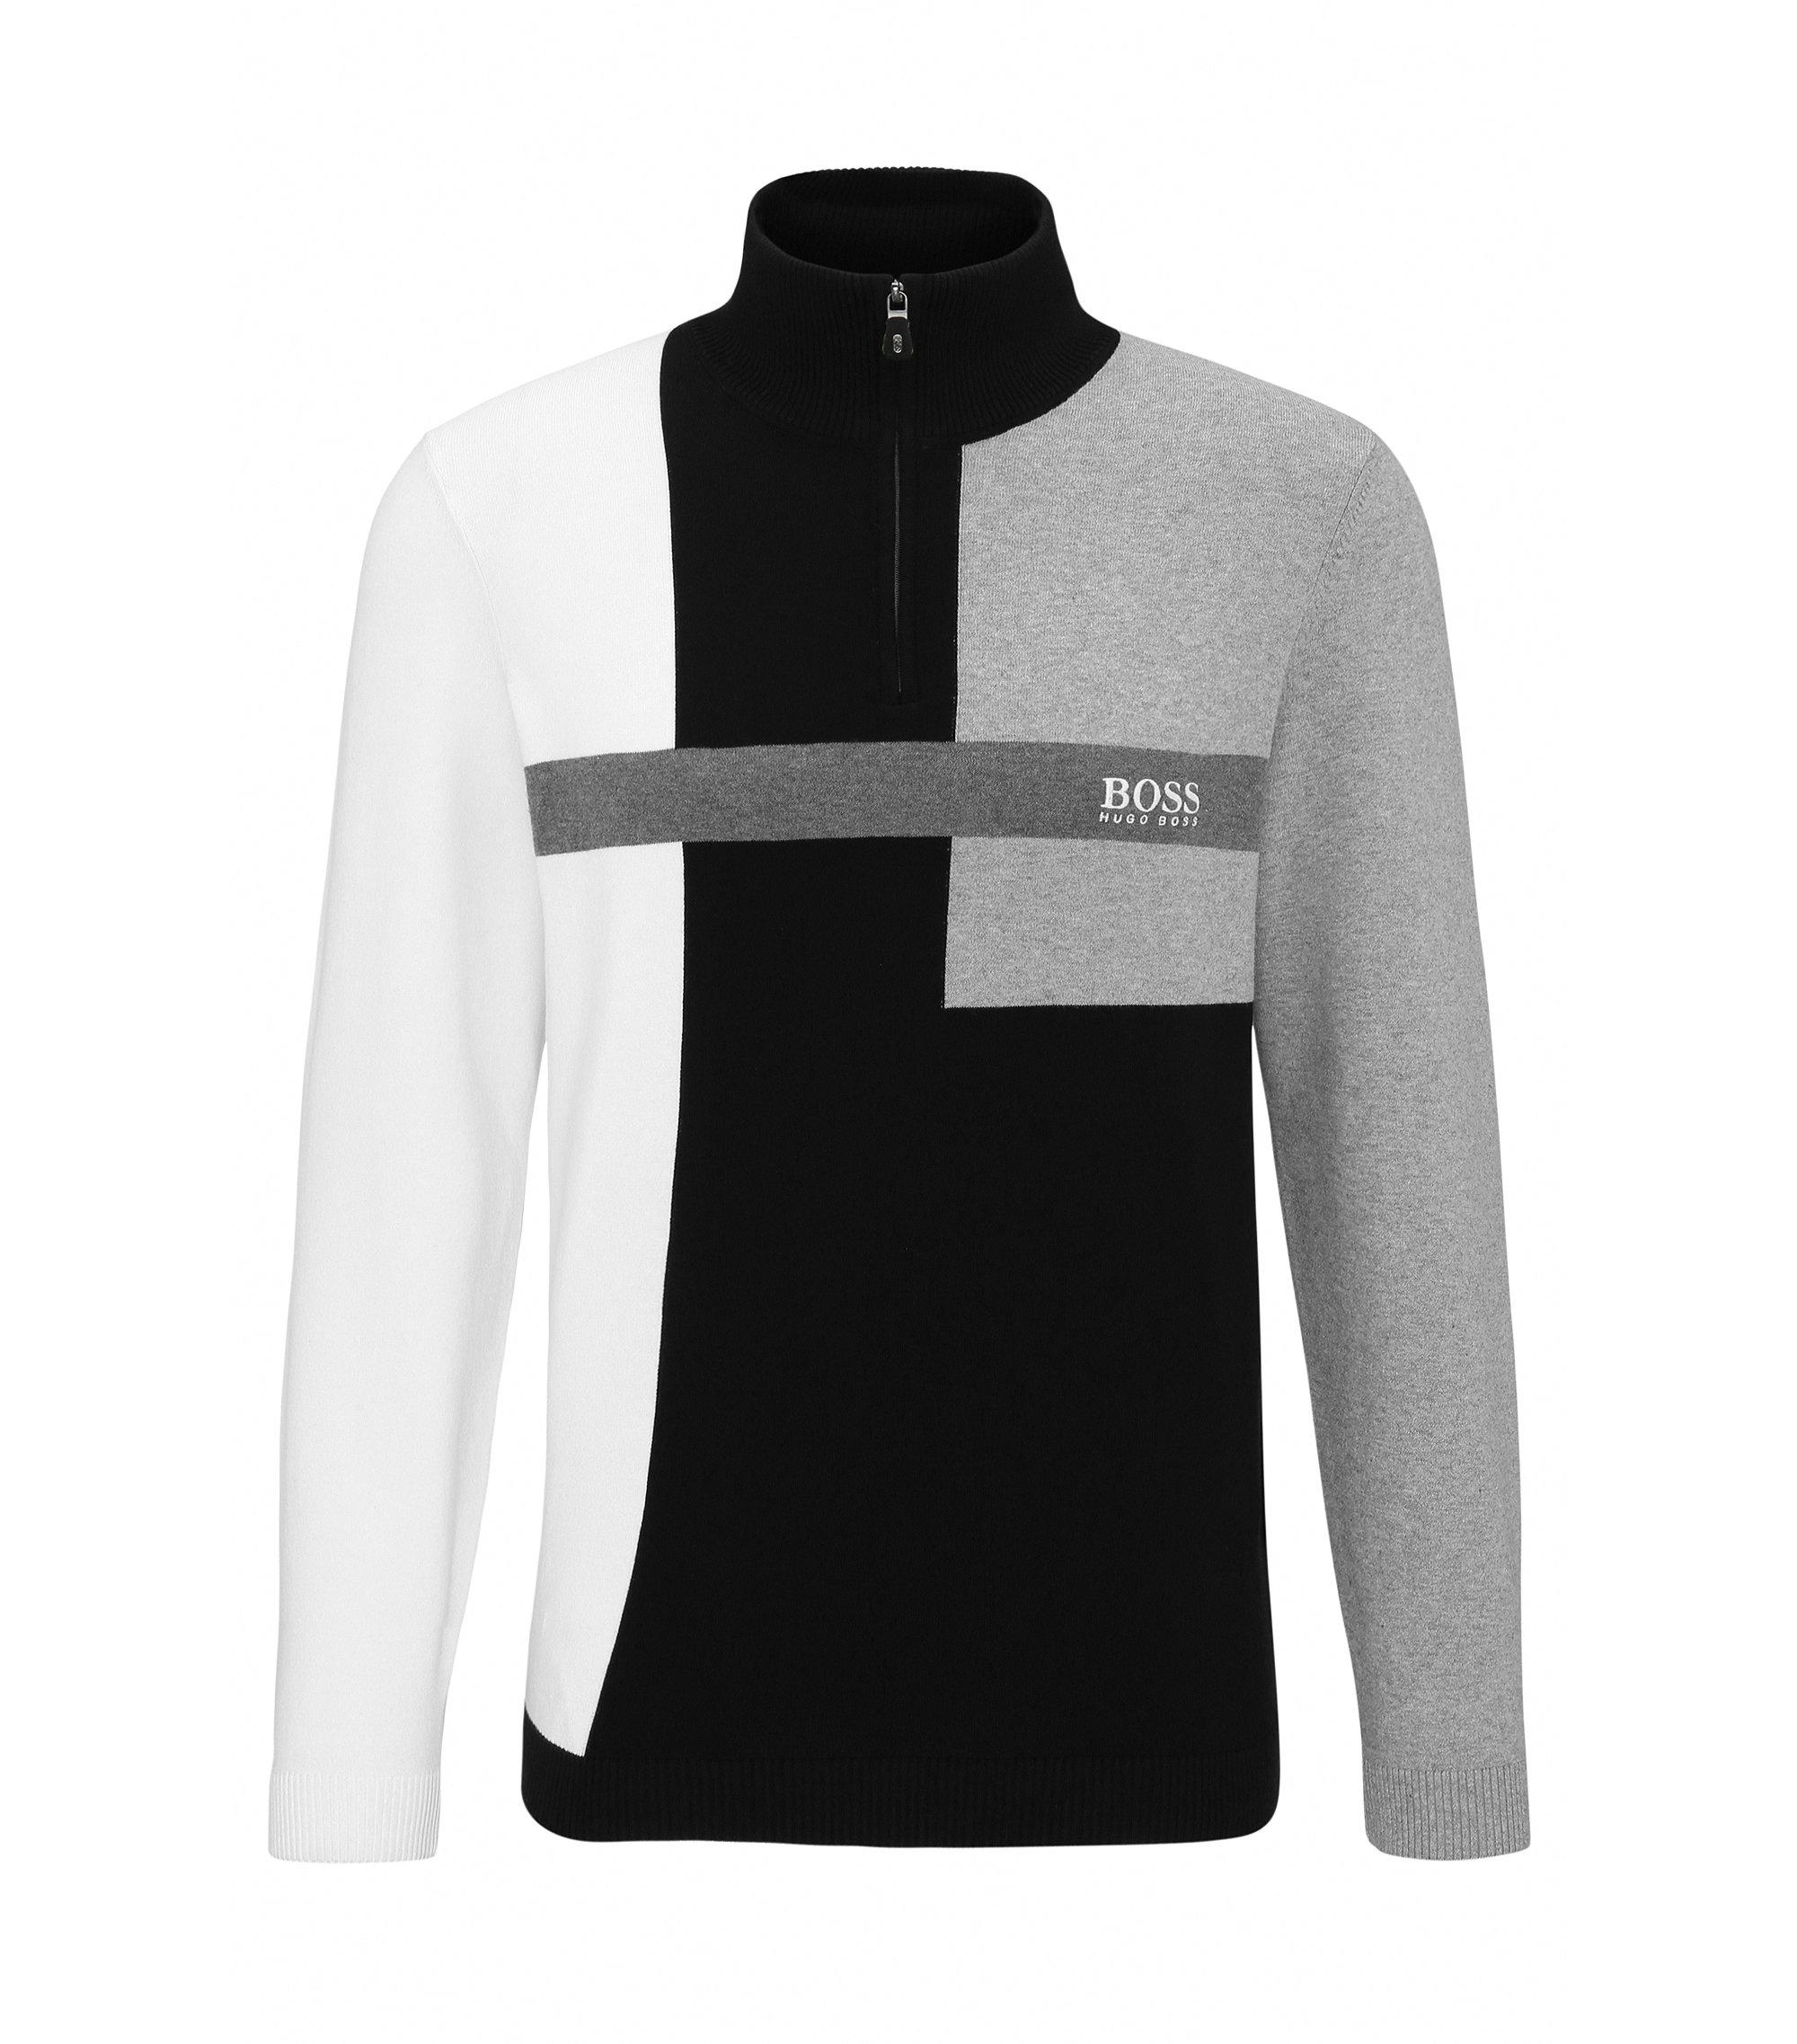 Colorblock Stretch Cotton Sweater   Zelchior Pro W17, Black